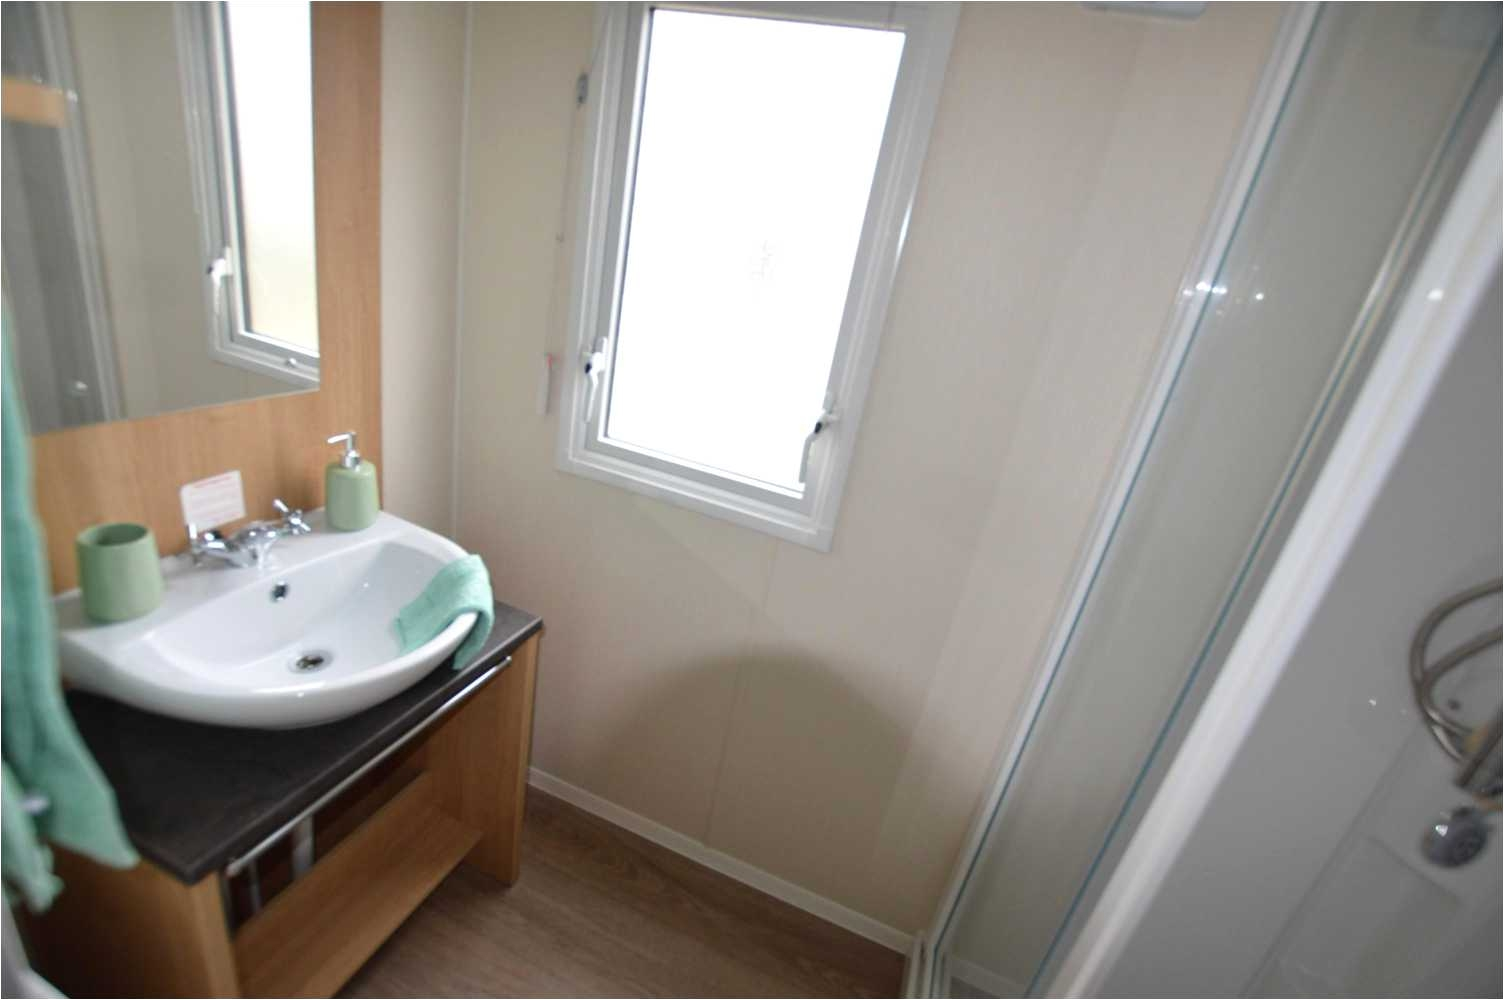 installing kitchen sink fresh furniture awesome the sink inspirational h sink new bathroom i 0d